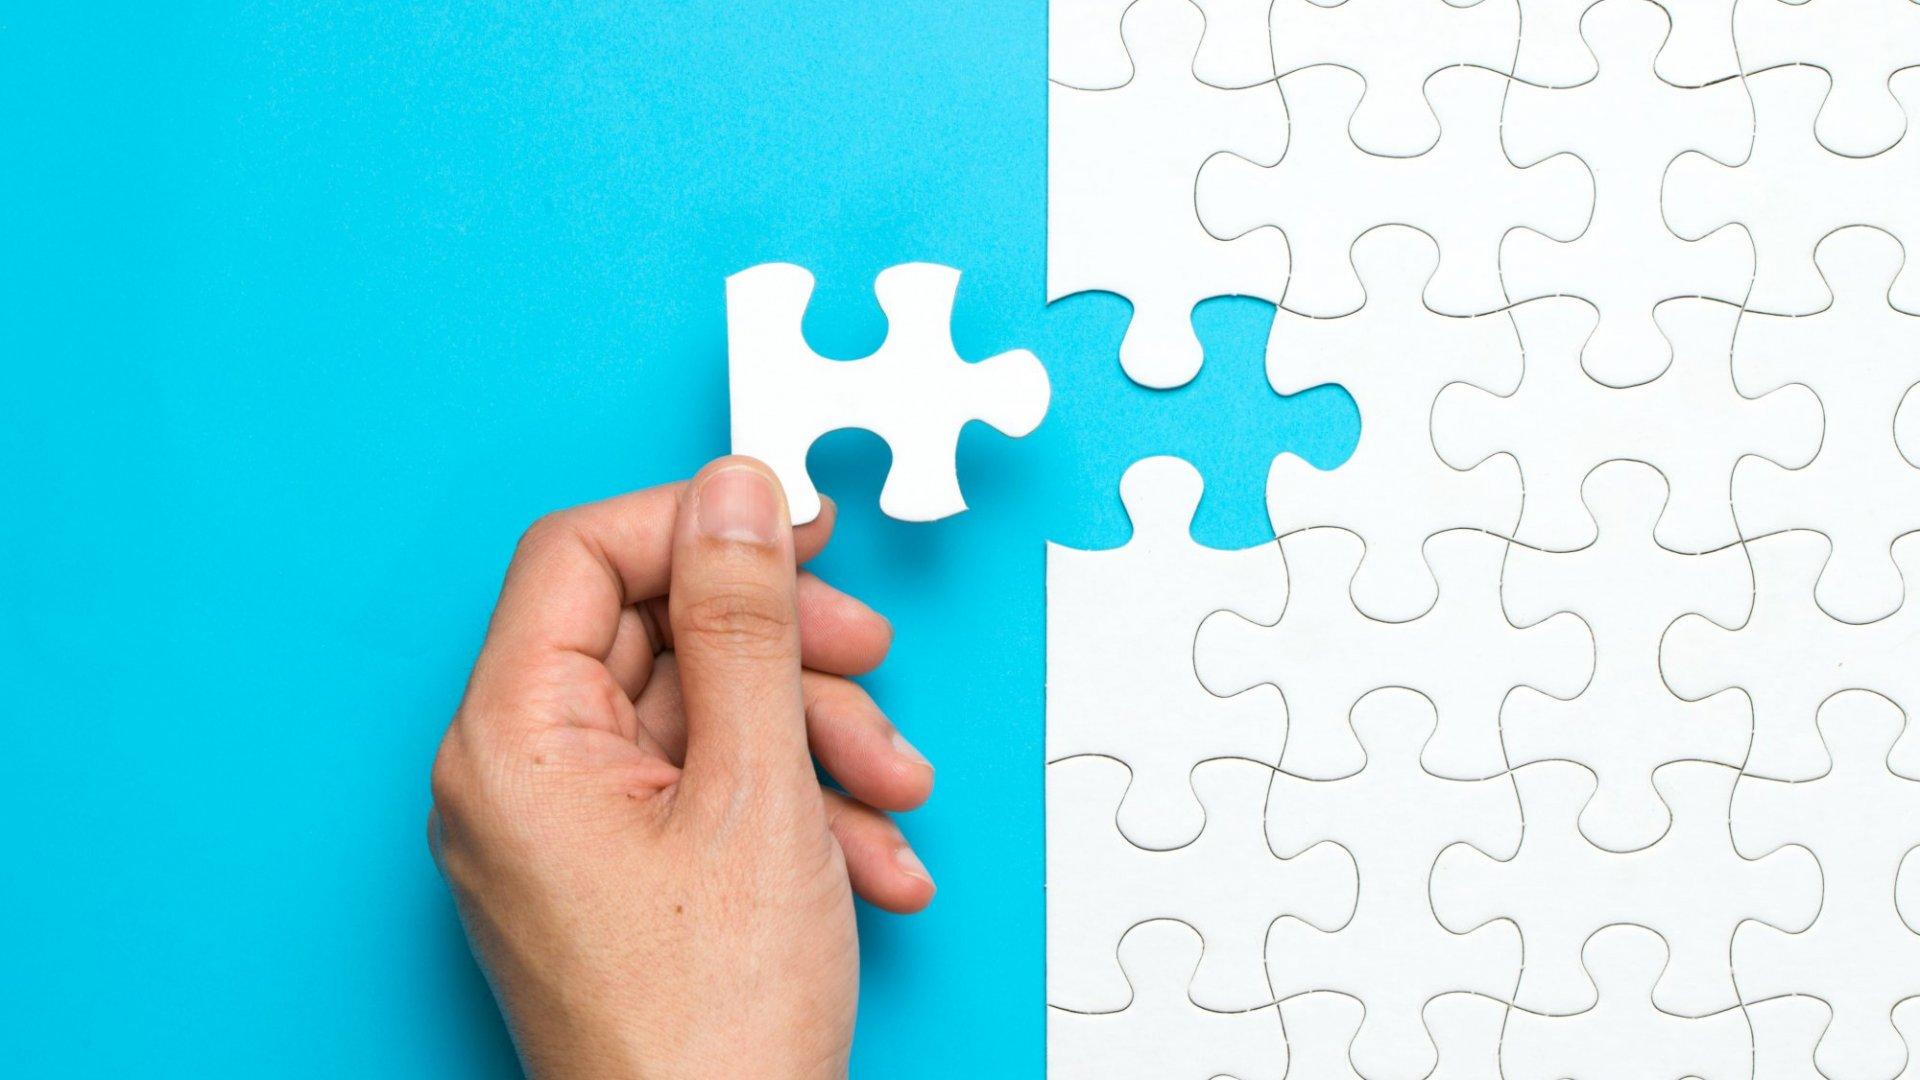 4 Ways to Build a Successful Partnership